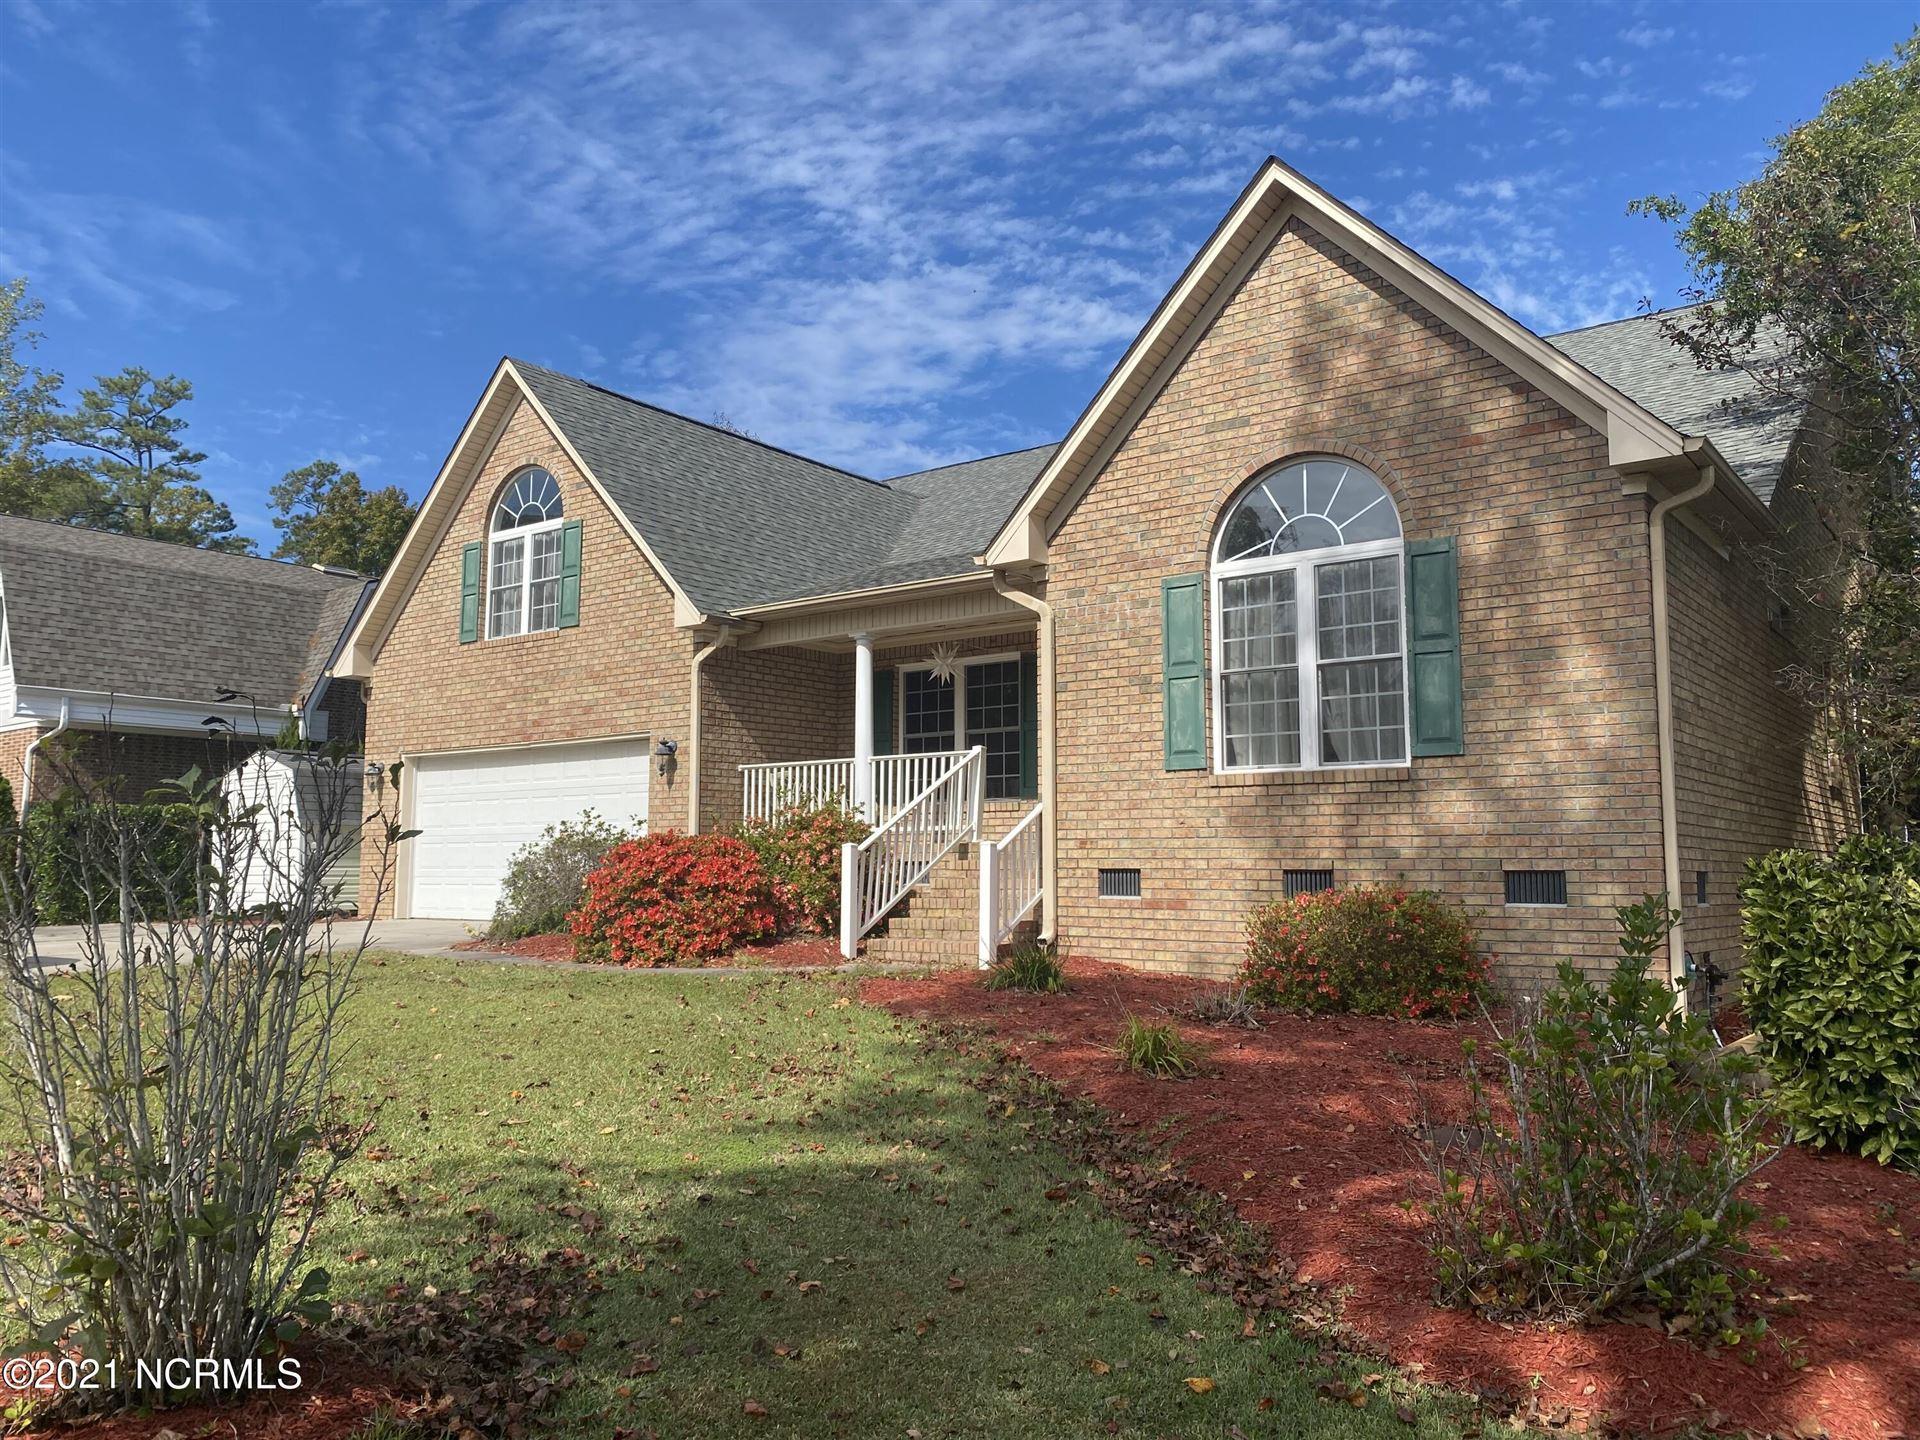 Photo of 414 Cherry Branch Drive, Havelock, NC 28532 (MLS # 100296110)